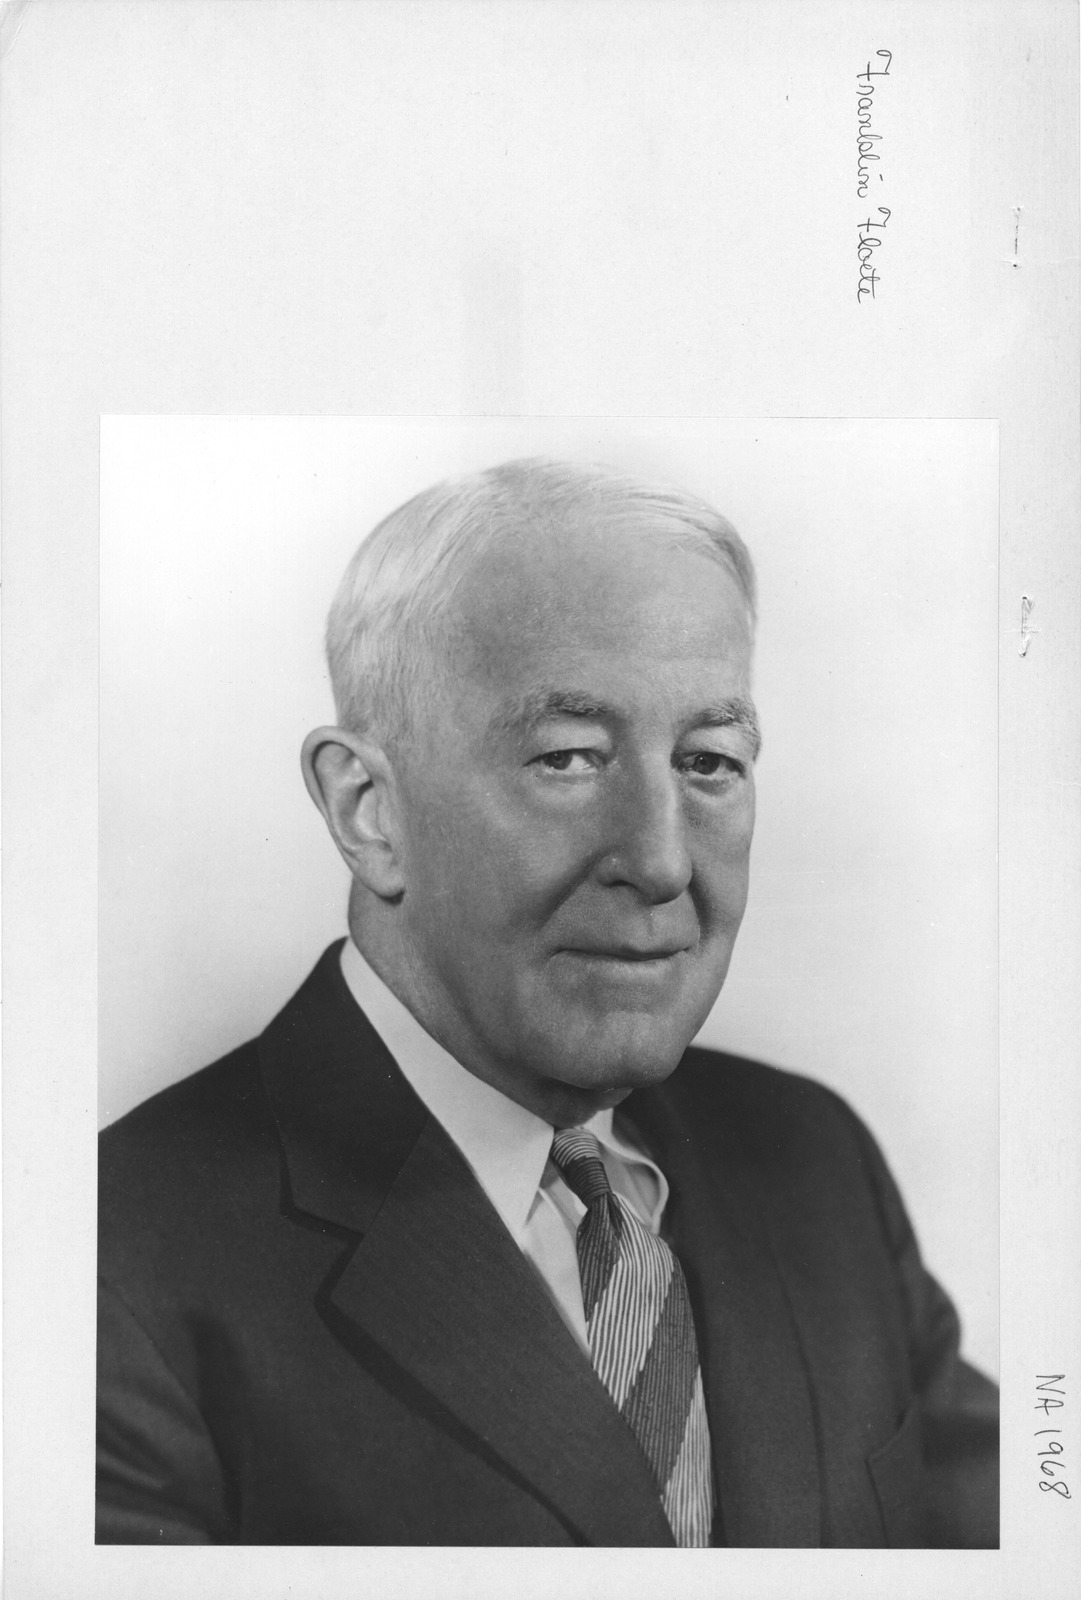 Photograph of GSA Administrator Franklin Floete